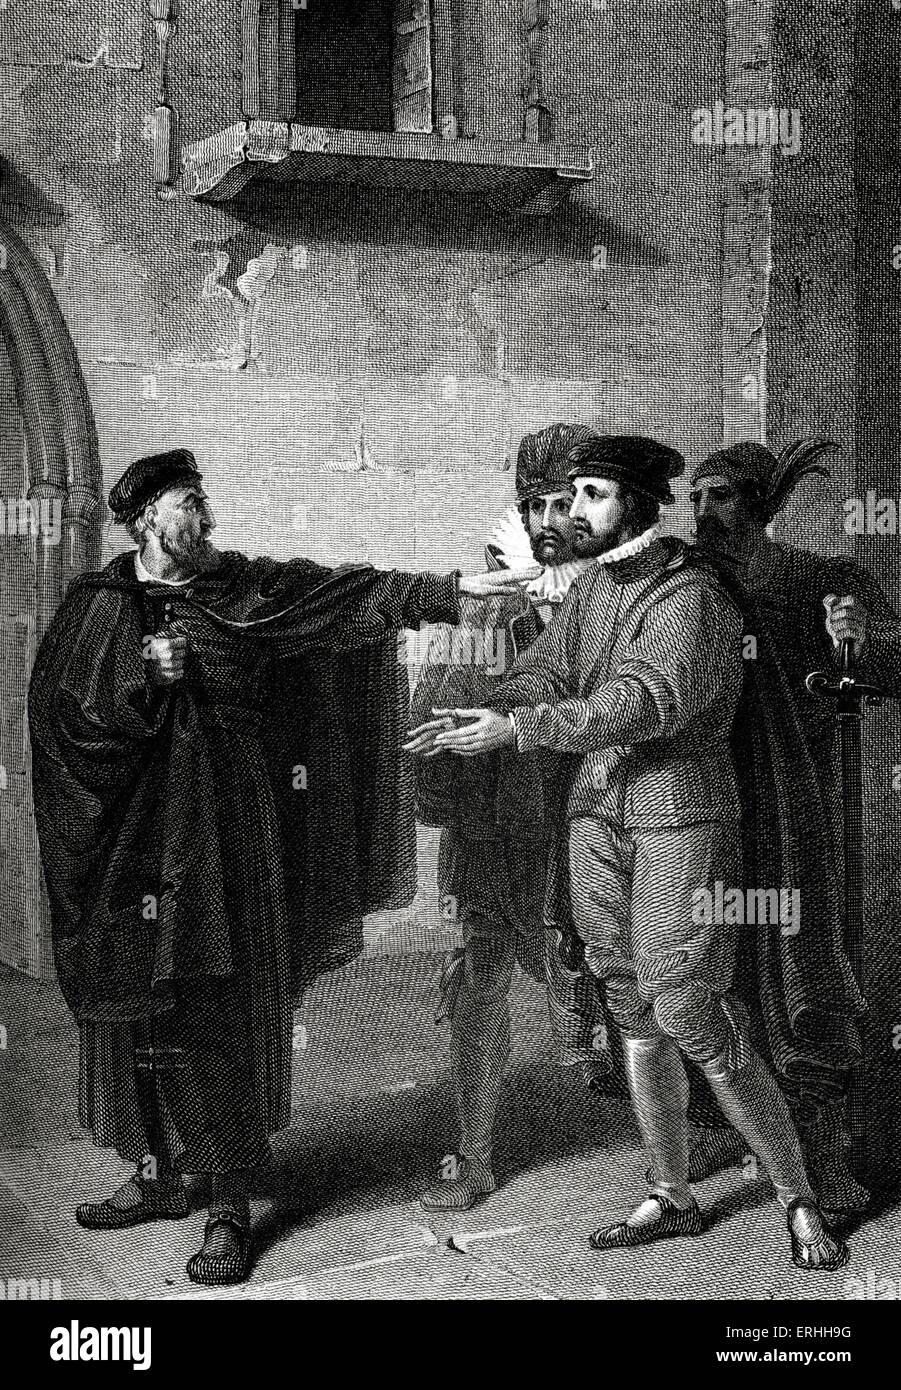 William Shakespeare 's play The Merchant of Venice  -  Act III Scene III: Shylock , Salarino , Antonio and Gaoler. - Stock Image